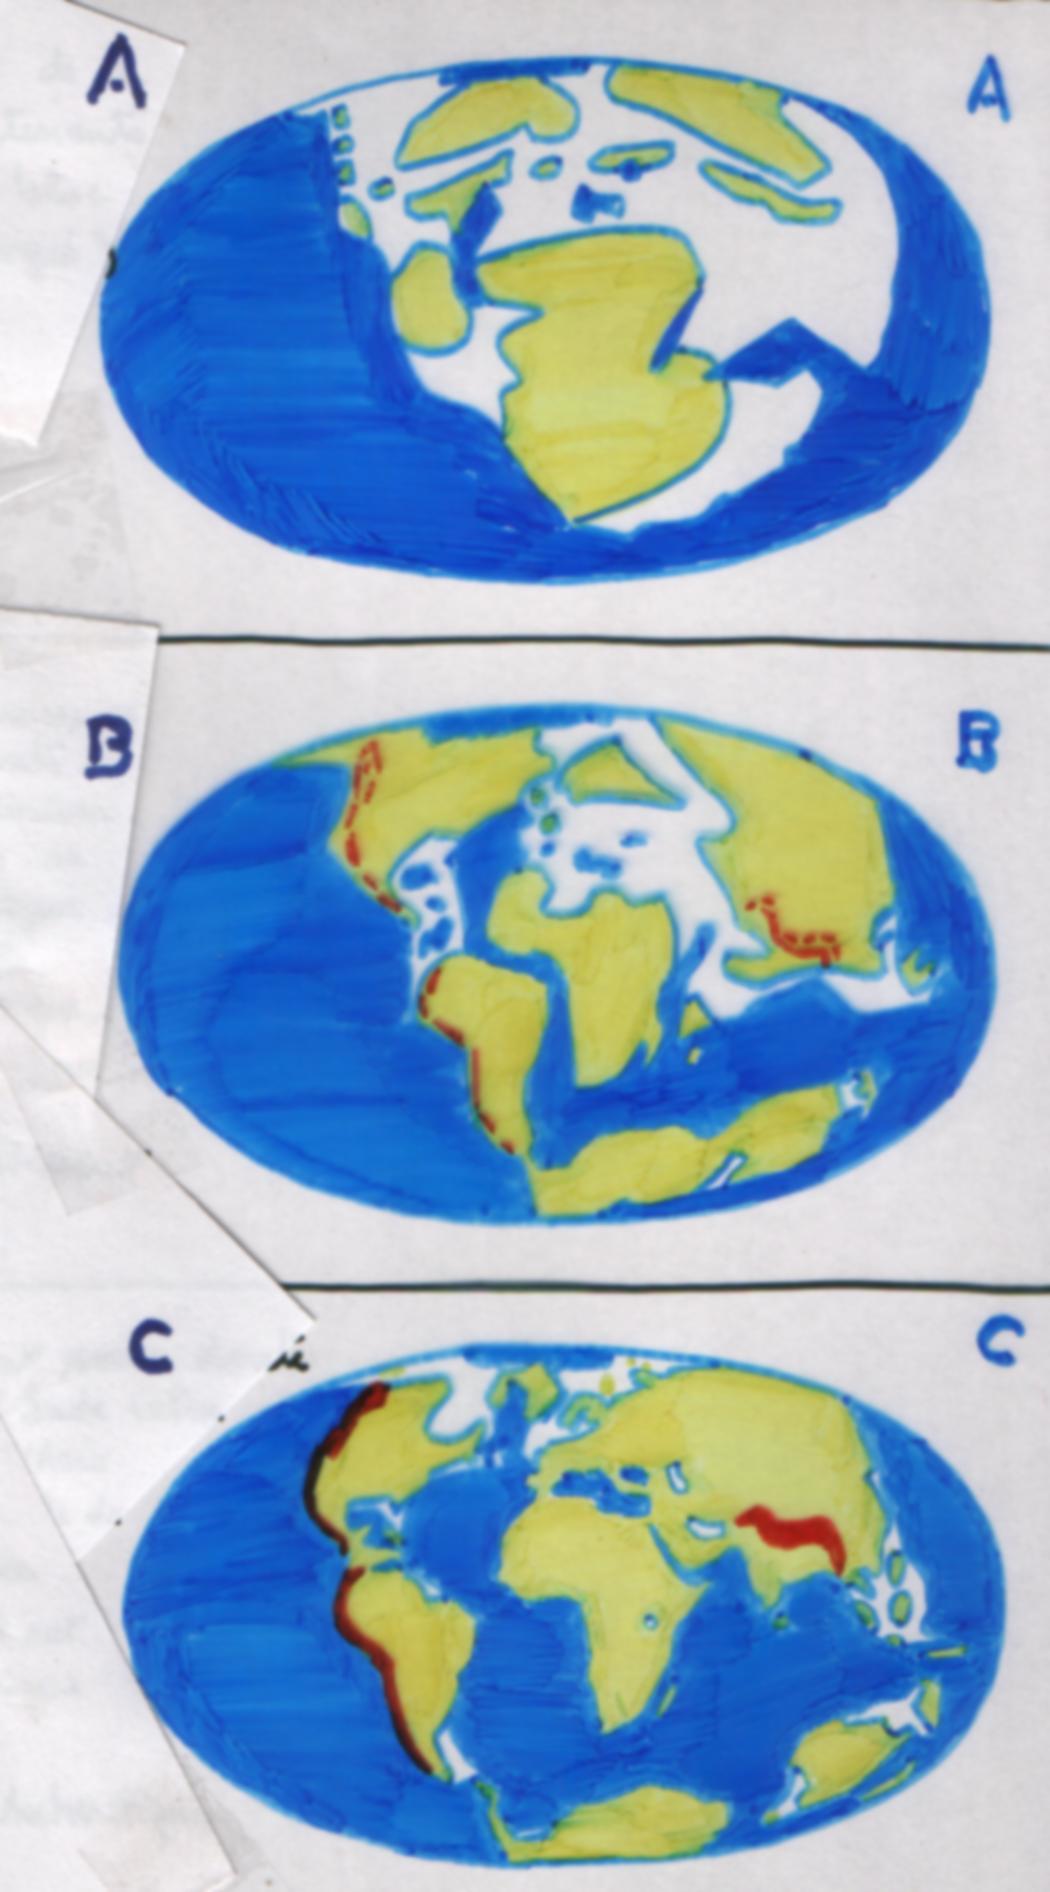 limites des continents